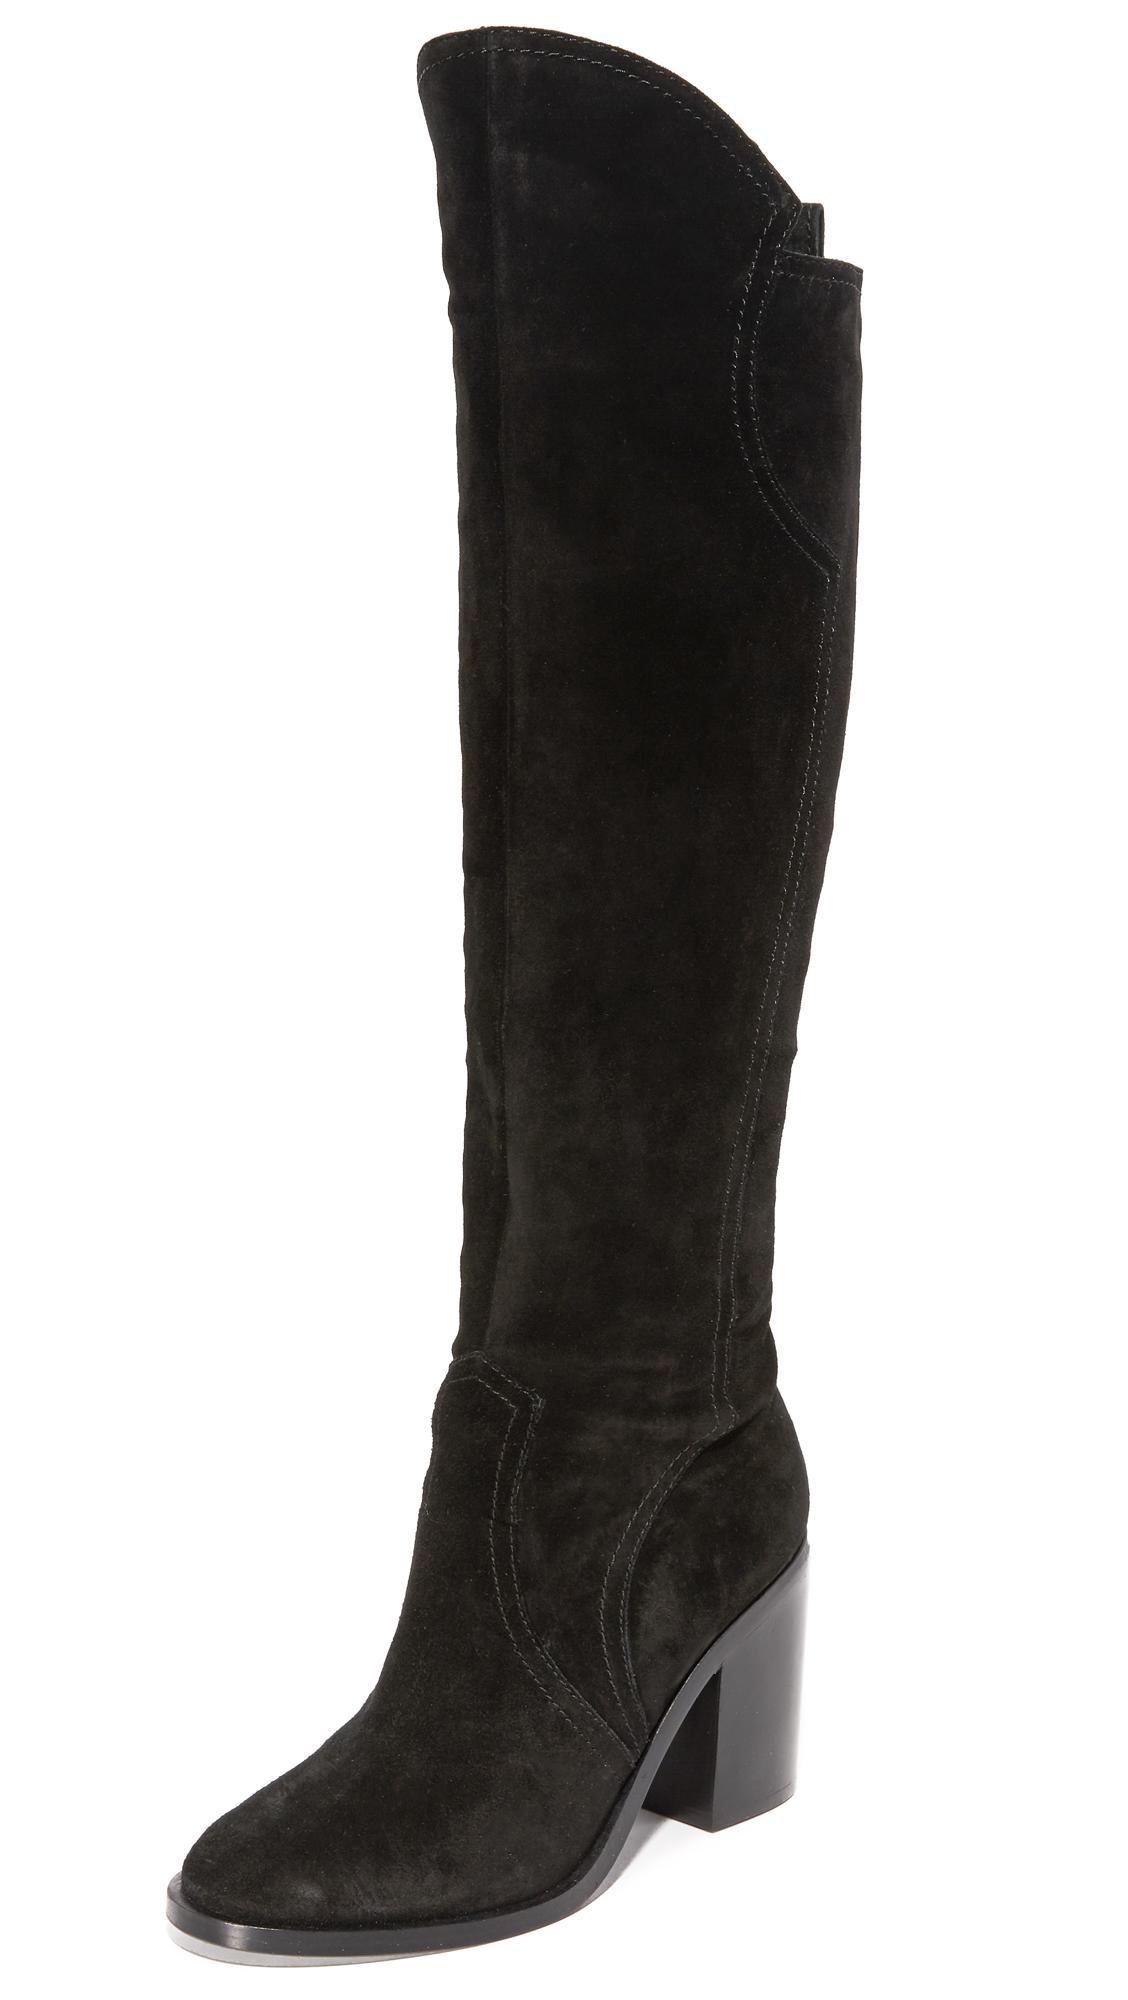 Sigerson Morrison Bambina Boots - Black